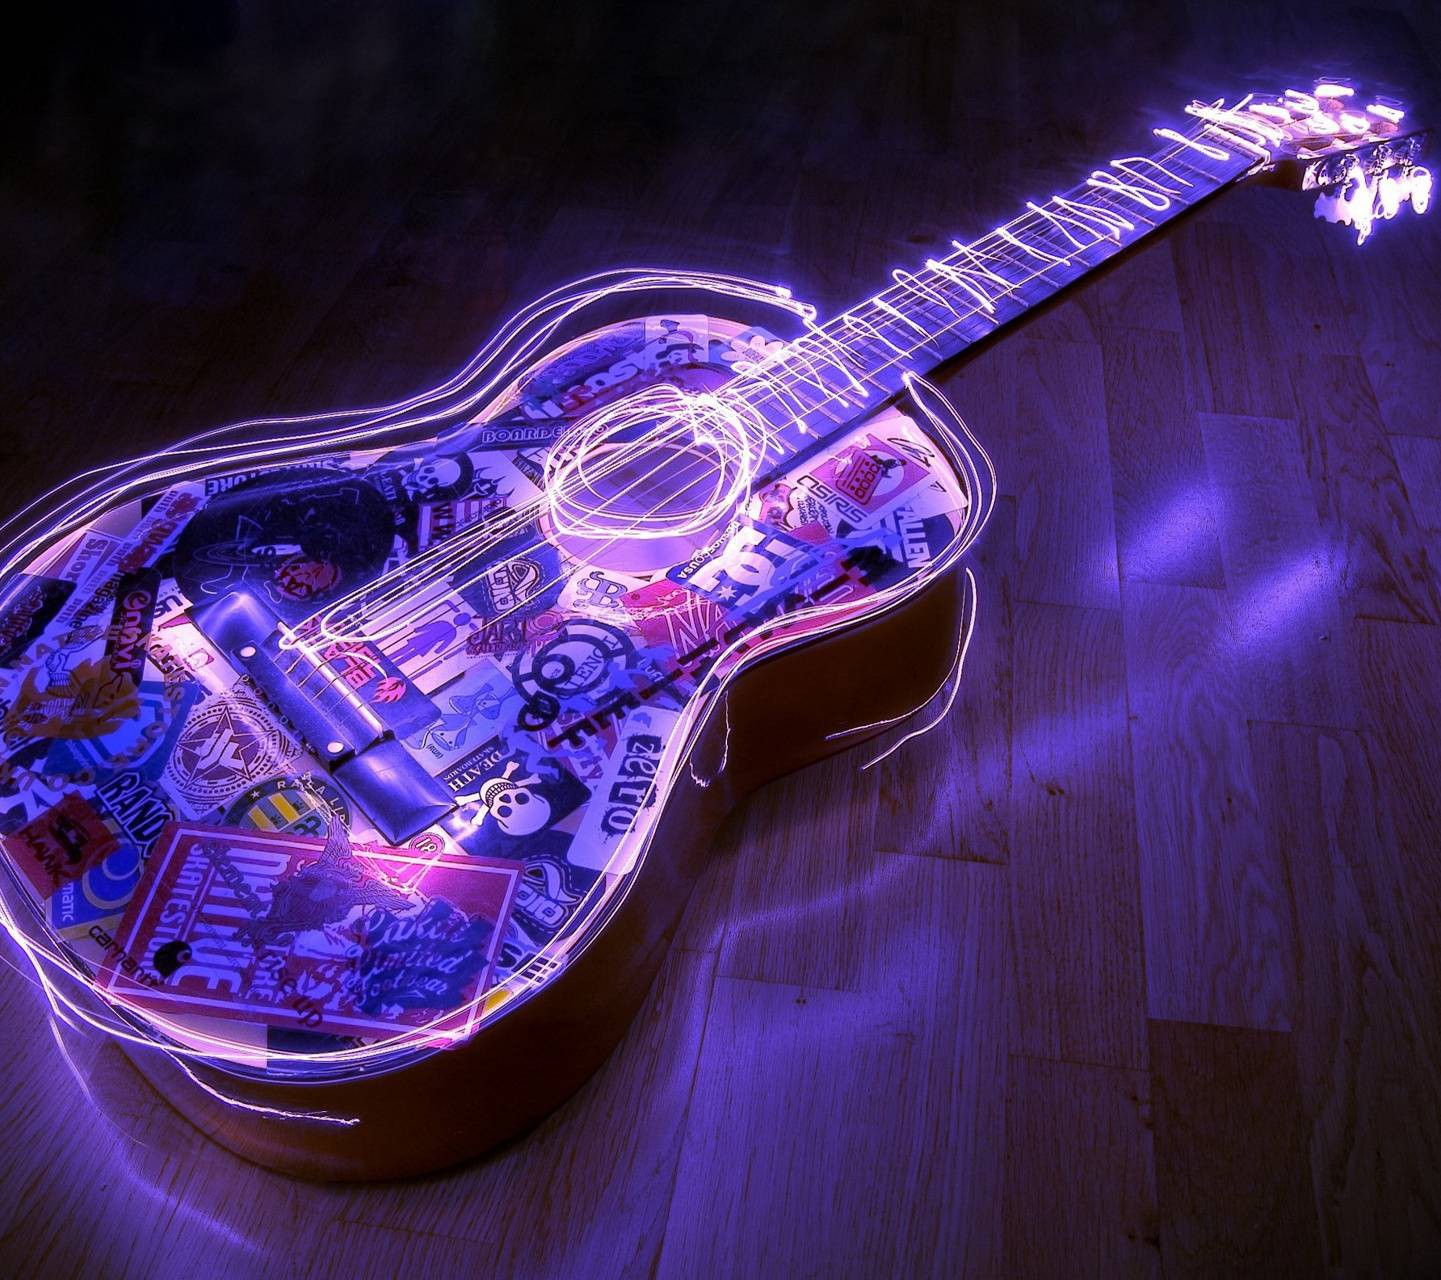 عکس زمینه گیتار نئون بنفش پس زمینه